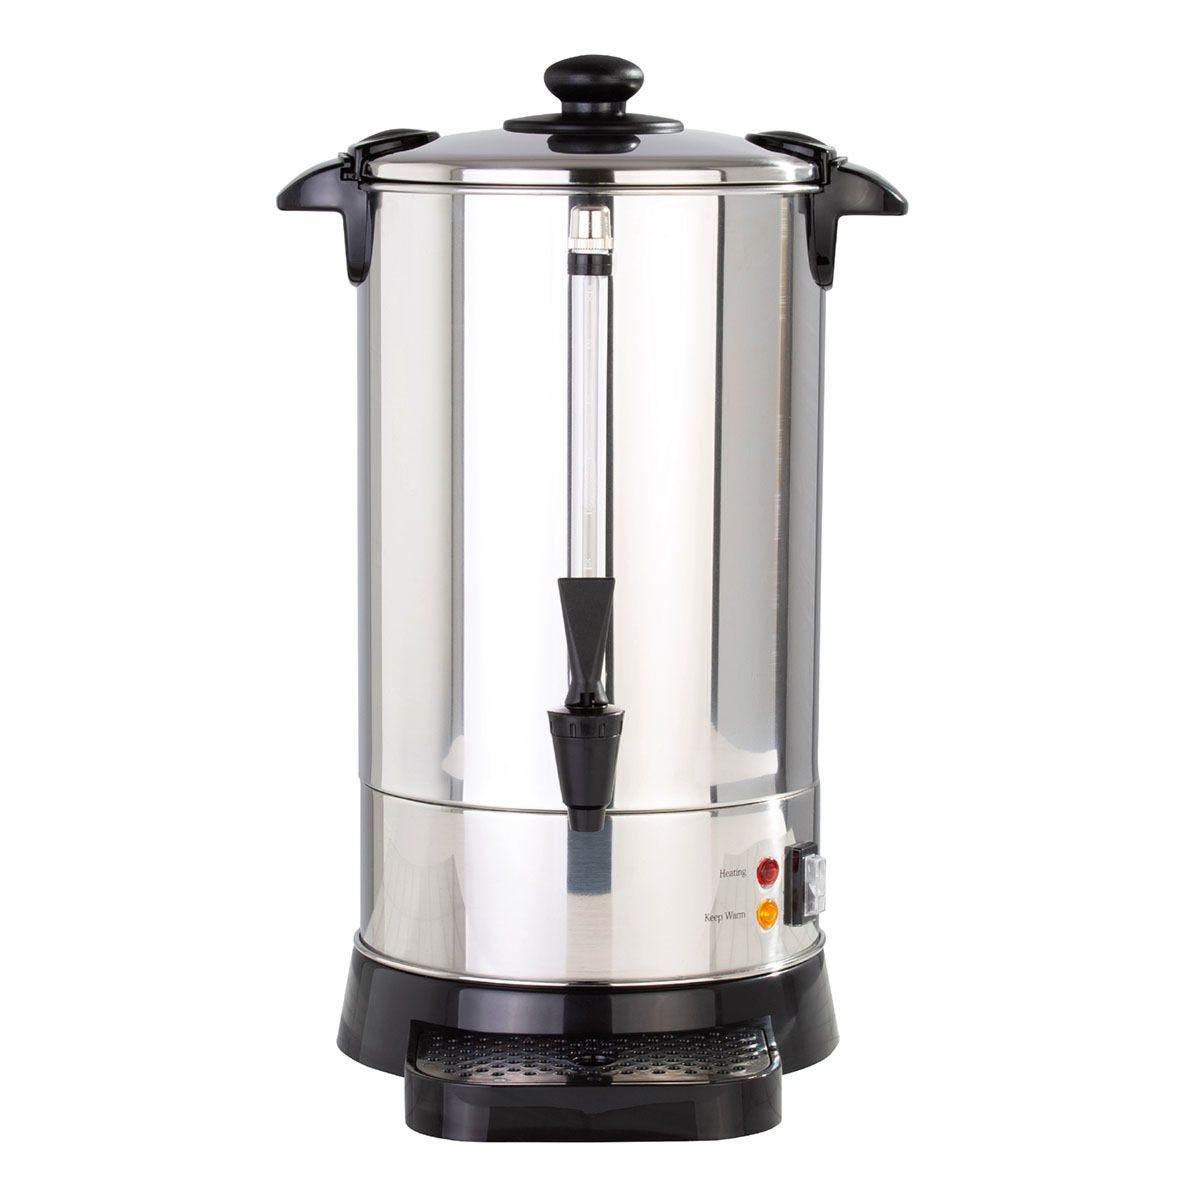 Fine Elements SDA1597 20L 1650W Water Urn – Silver